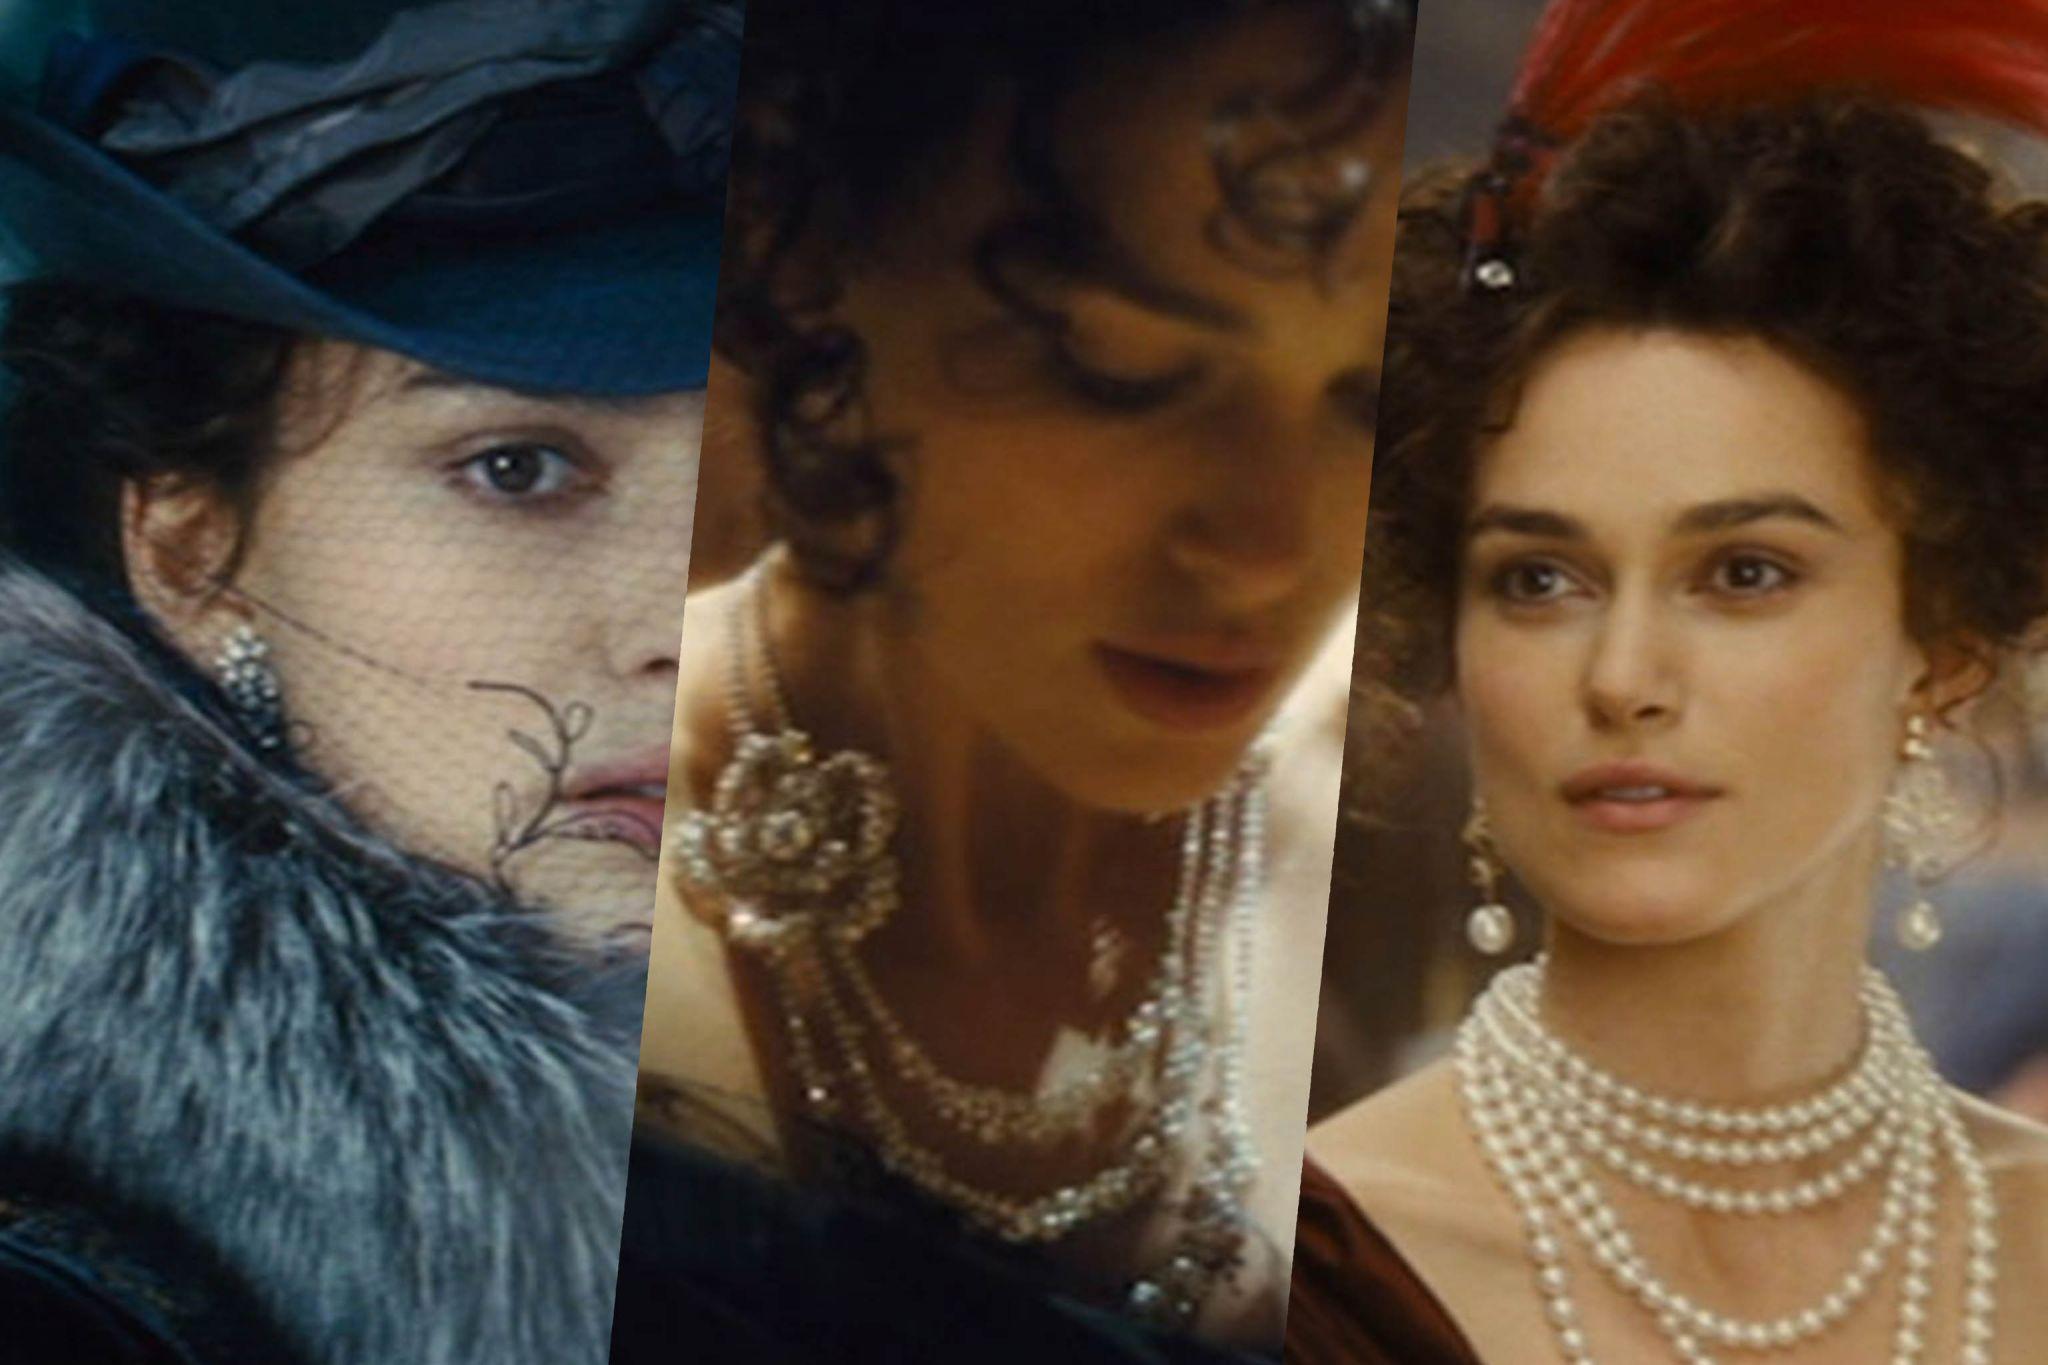 As seen on Anna Karenine jewelry